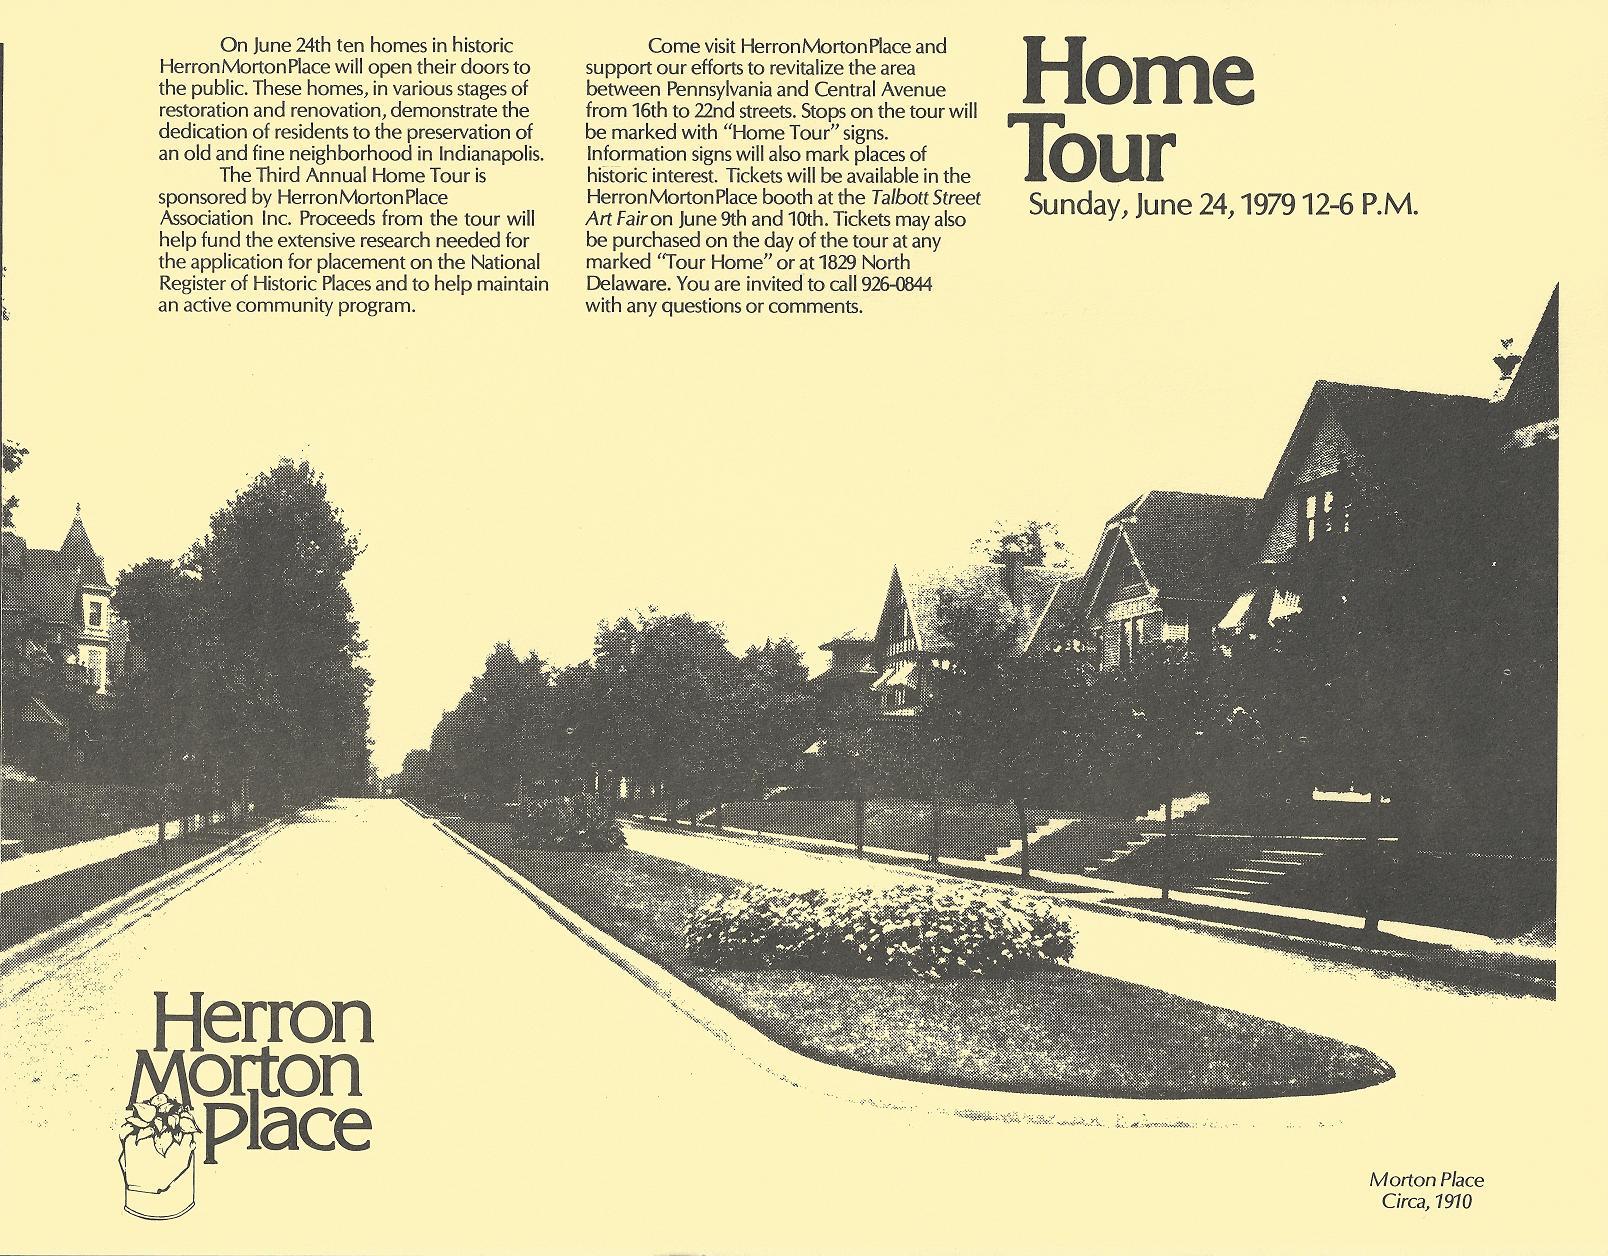 Sunday Ads: Herron-Morton Place Home Tour